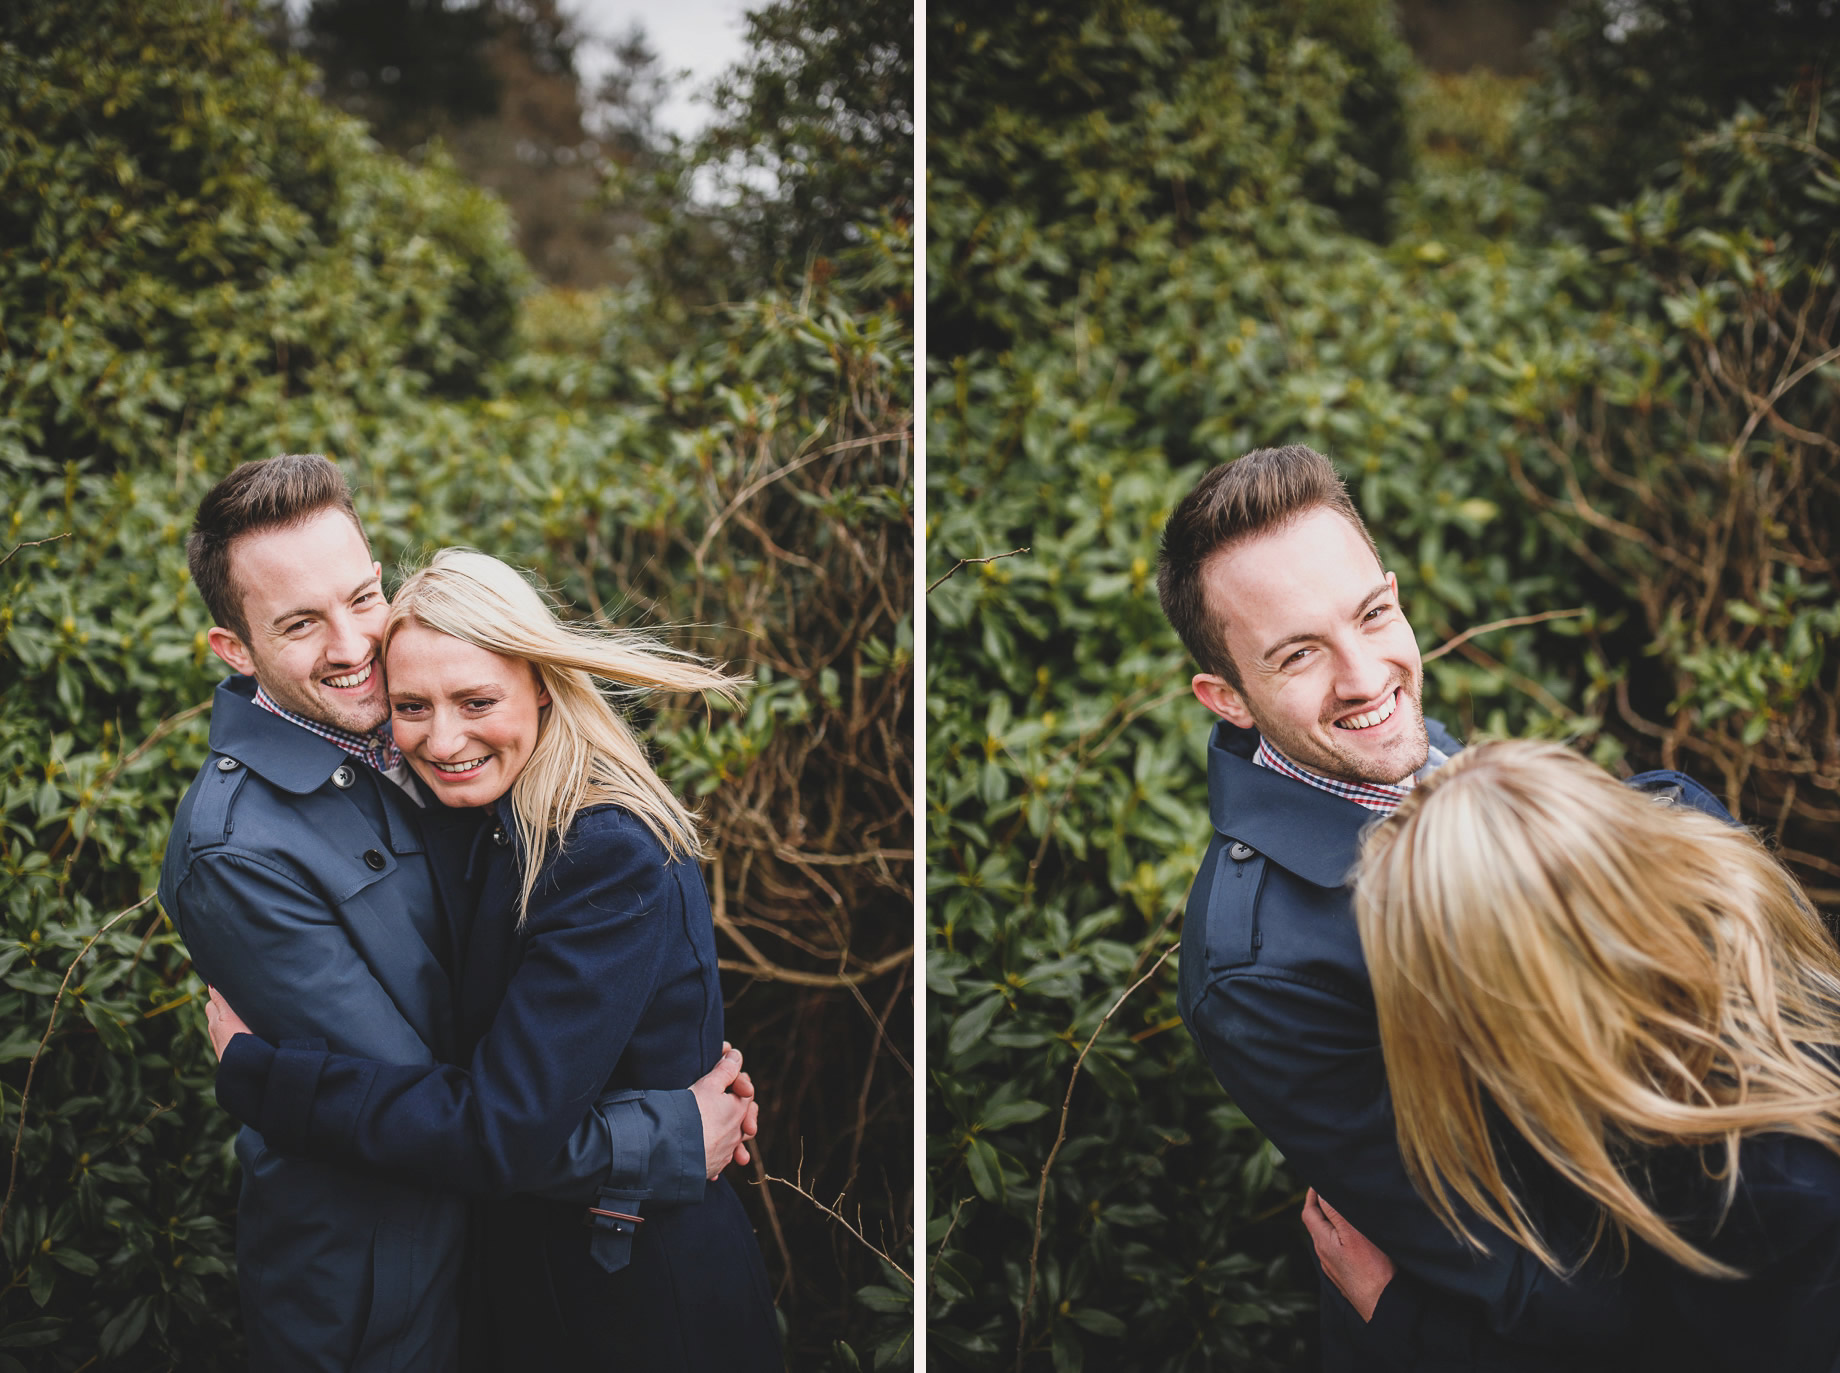 Rachel and Christian Pre-Wedding Shoot at Errwood Hall Ruins 023